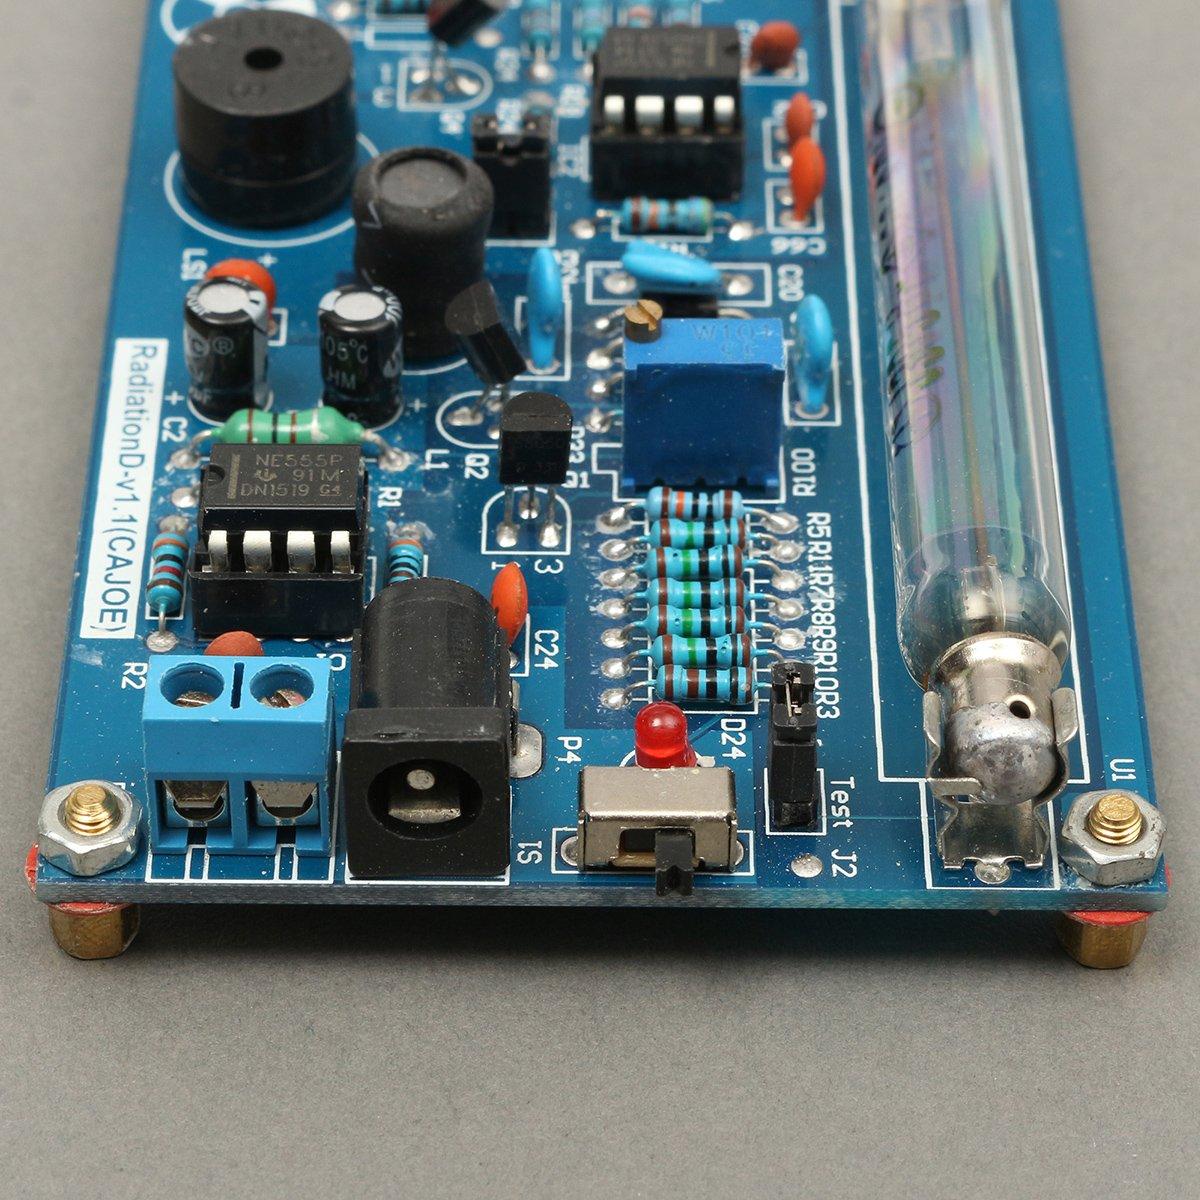 Bluelover Ensamblado Contador de Kit de Geiger de DIY módulo Miller Tubo Detector de radiación Nuclear: Amazon.es: Hogar